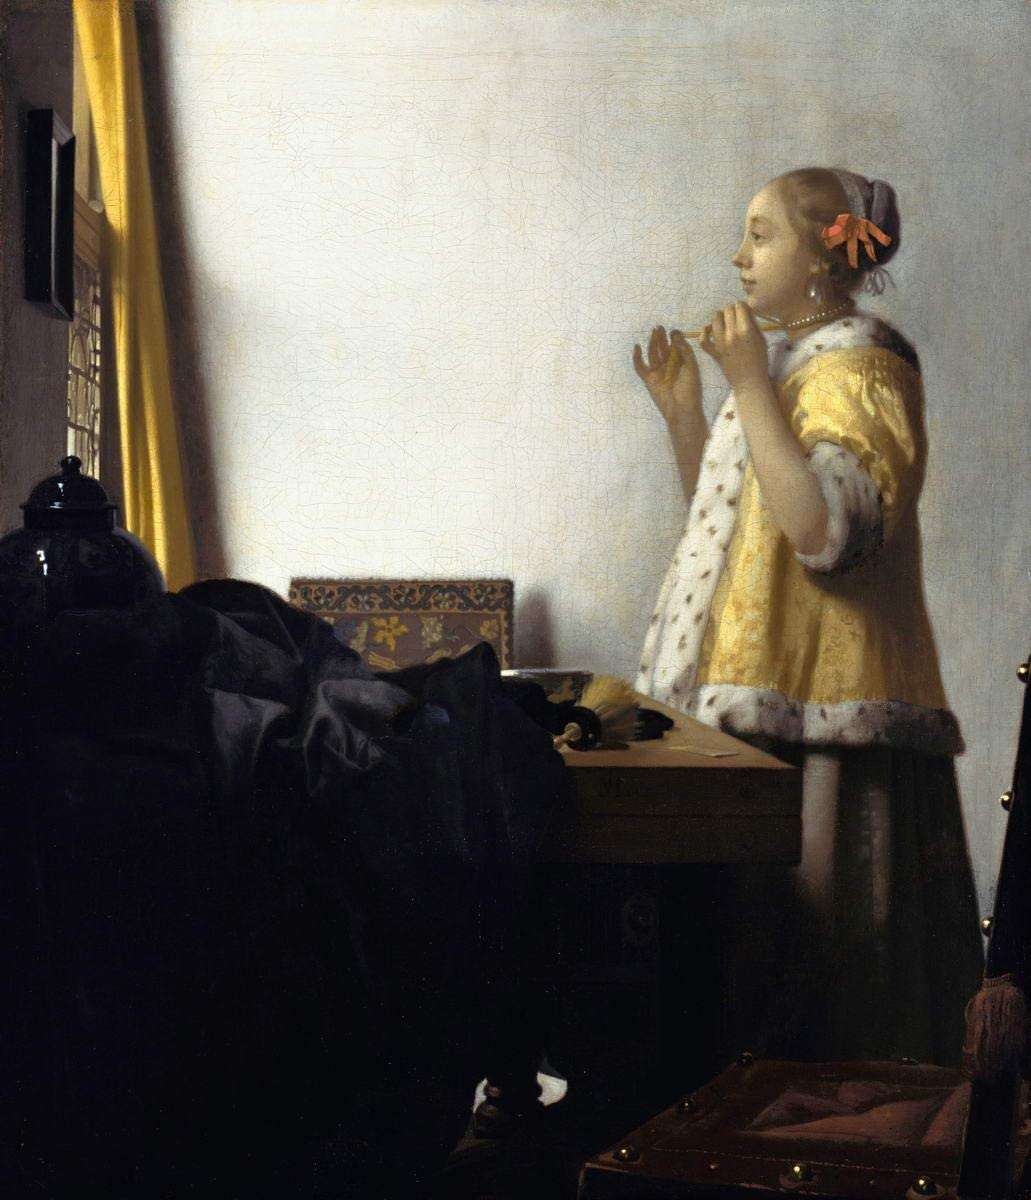 Berkin Arts Johannes Vermeer Giclee Lienzo Impresión Pintura póster Reproducción Print(Mujer Joven con un Collar de Perlas)